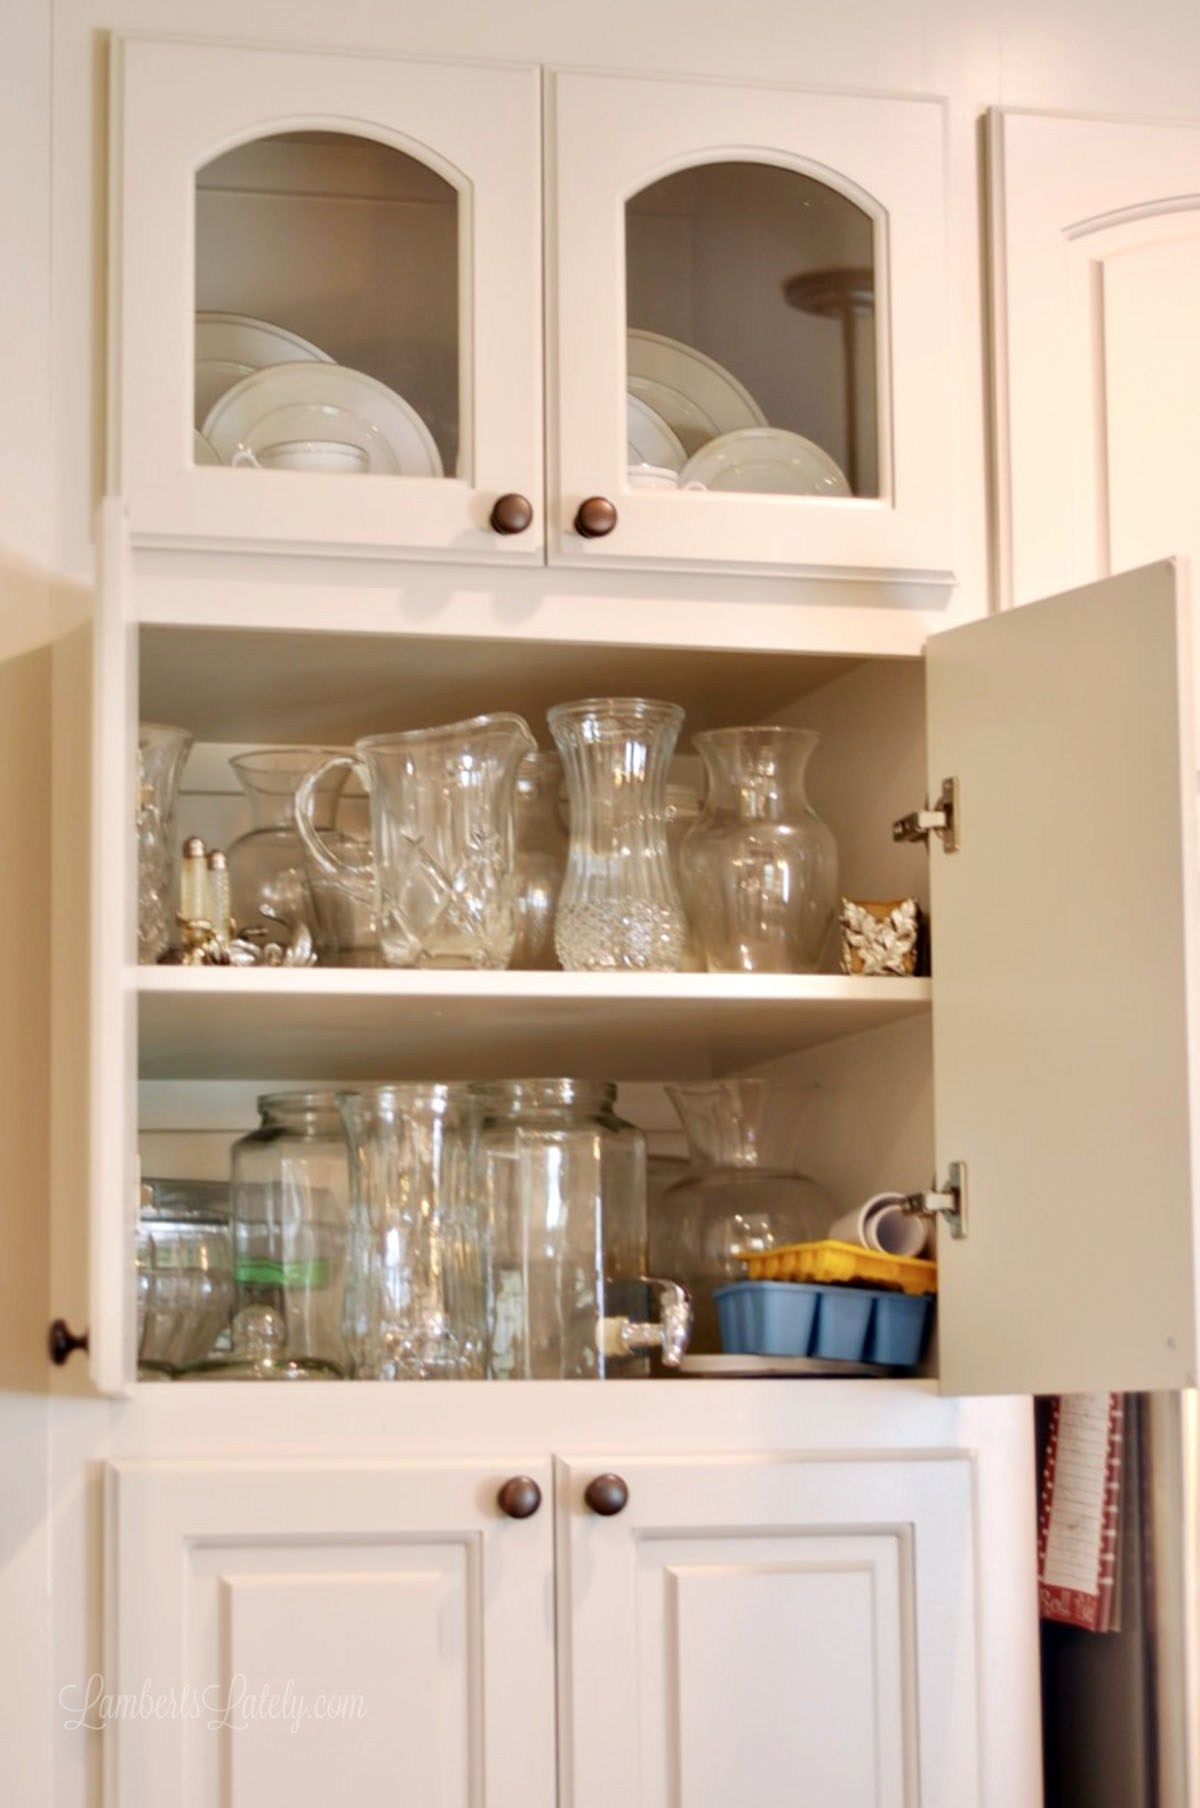 an organized kitchen tour kitchen organization cabinet design custom cabinets on kitchen decor organization id=48259